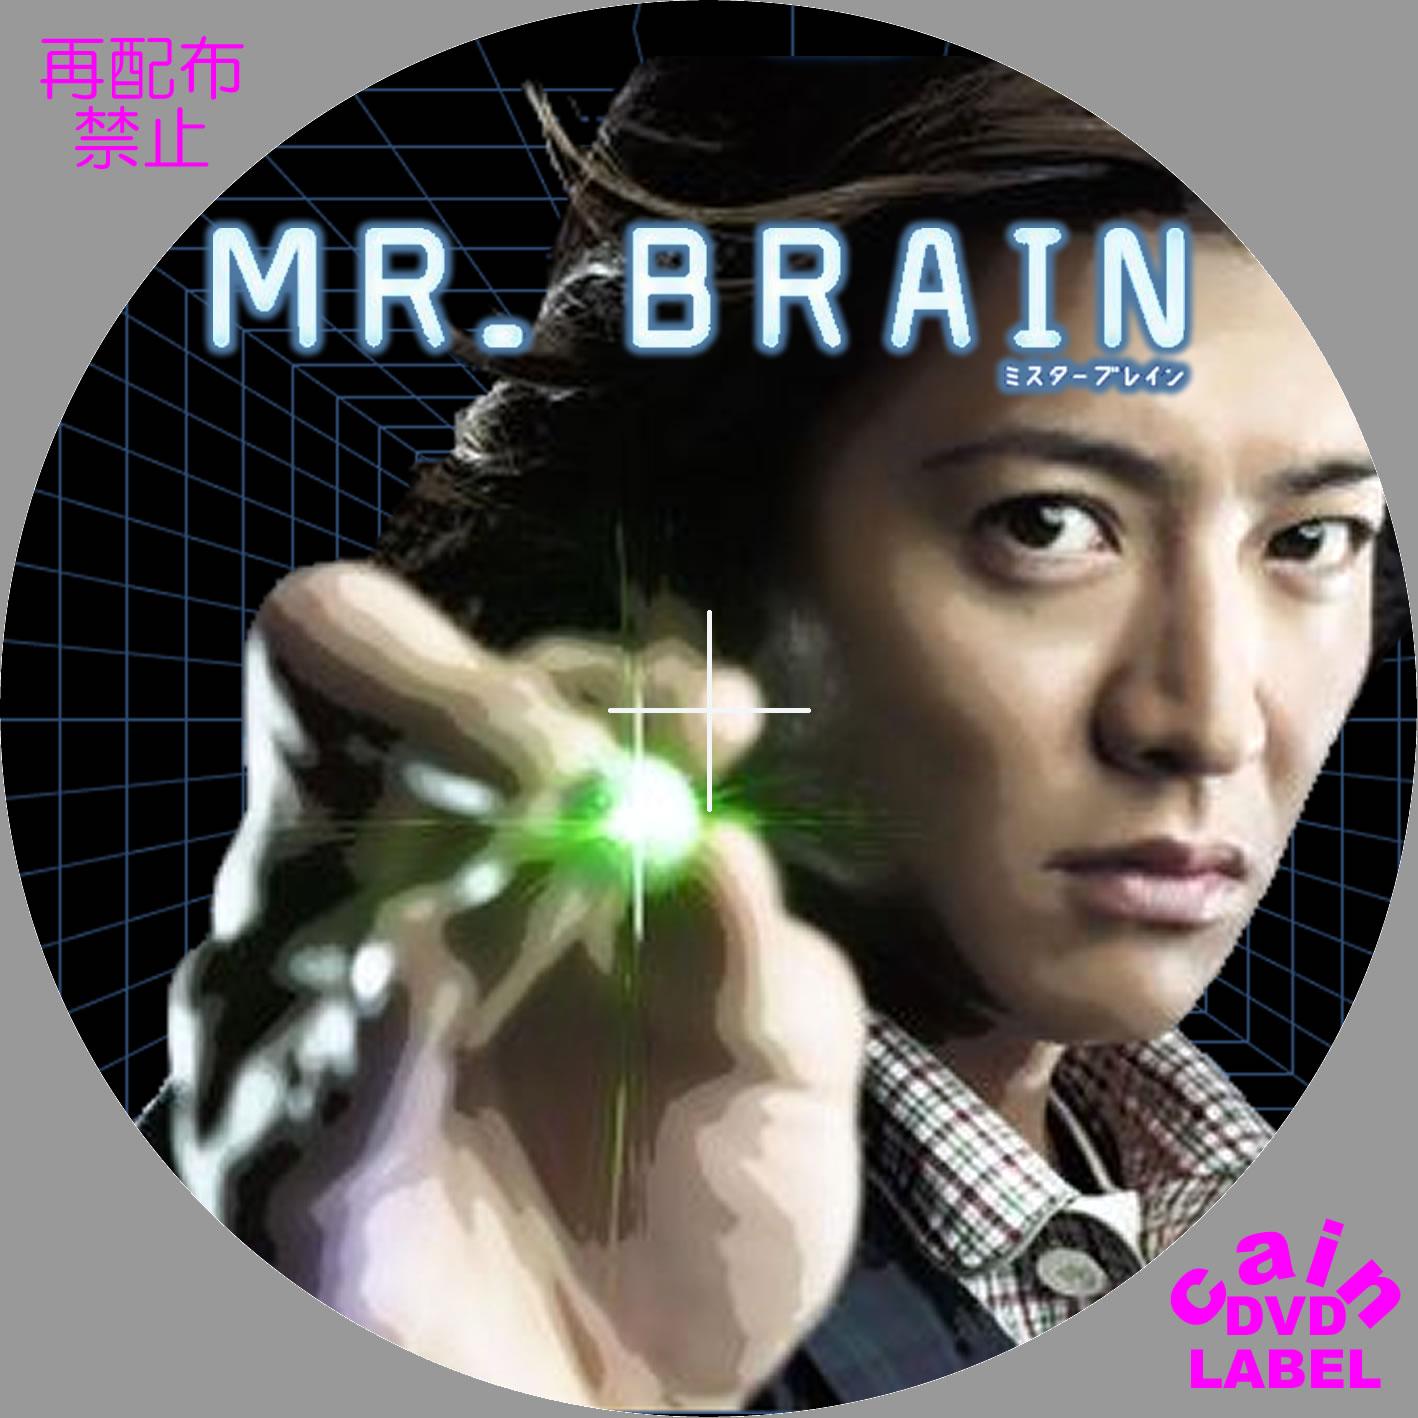 MR.BRAIN DVD-BOX TCエンタテインメント 価格比較: 小原SERIのブログ